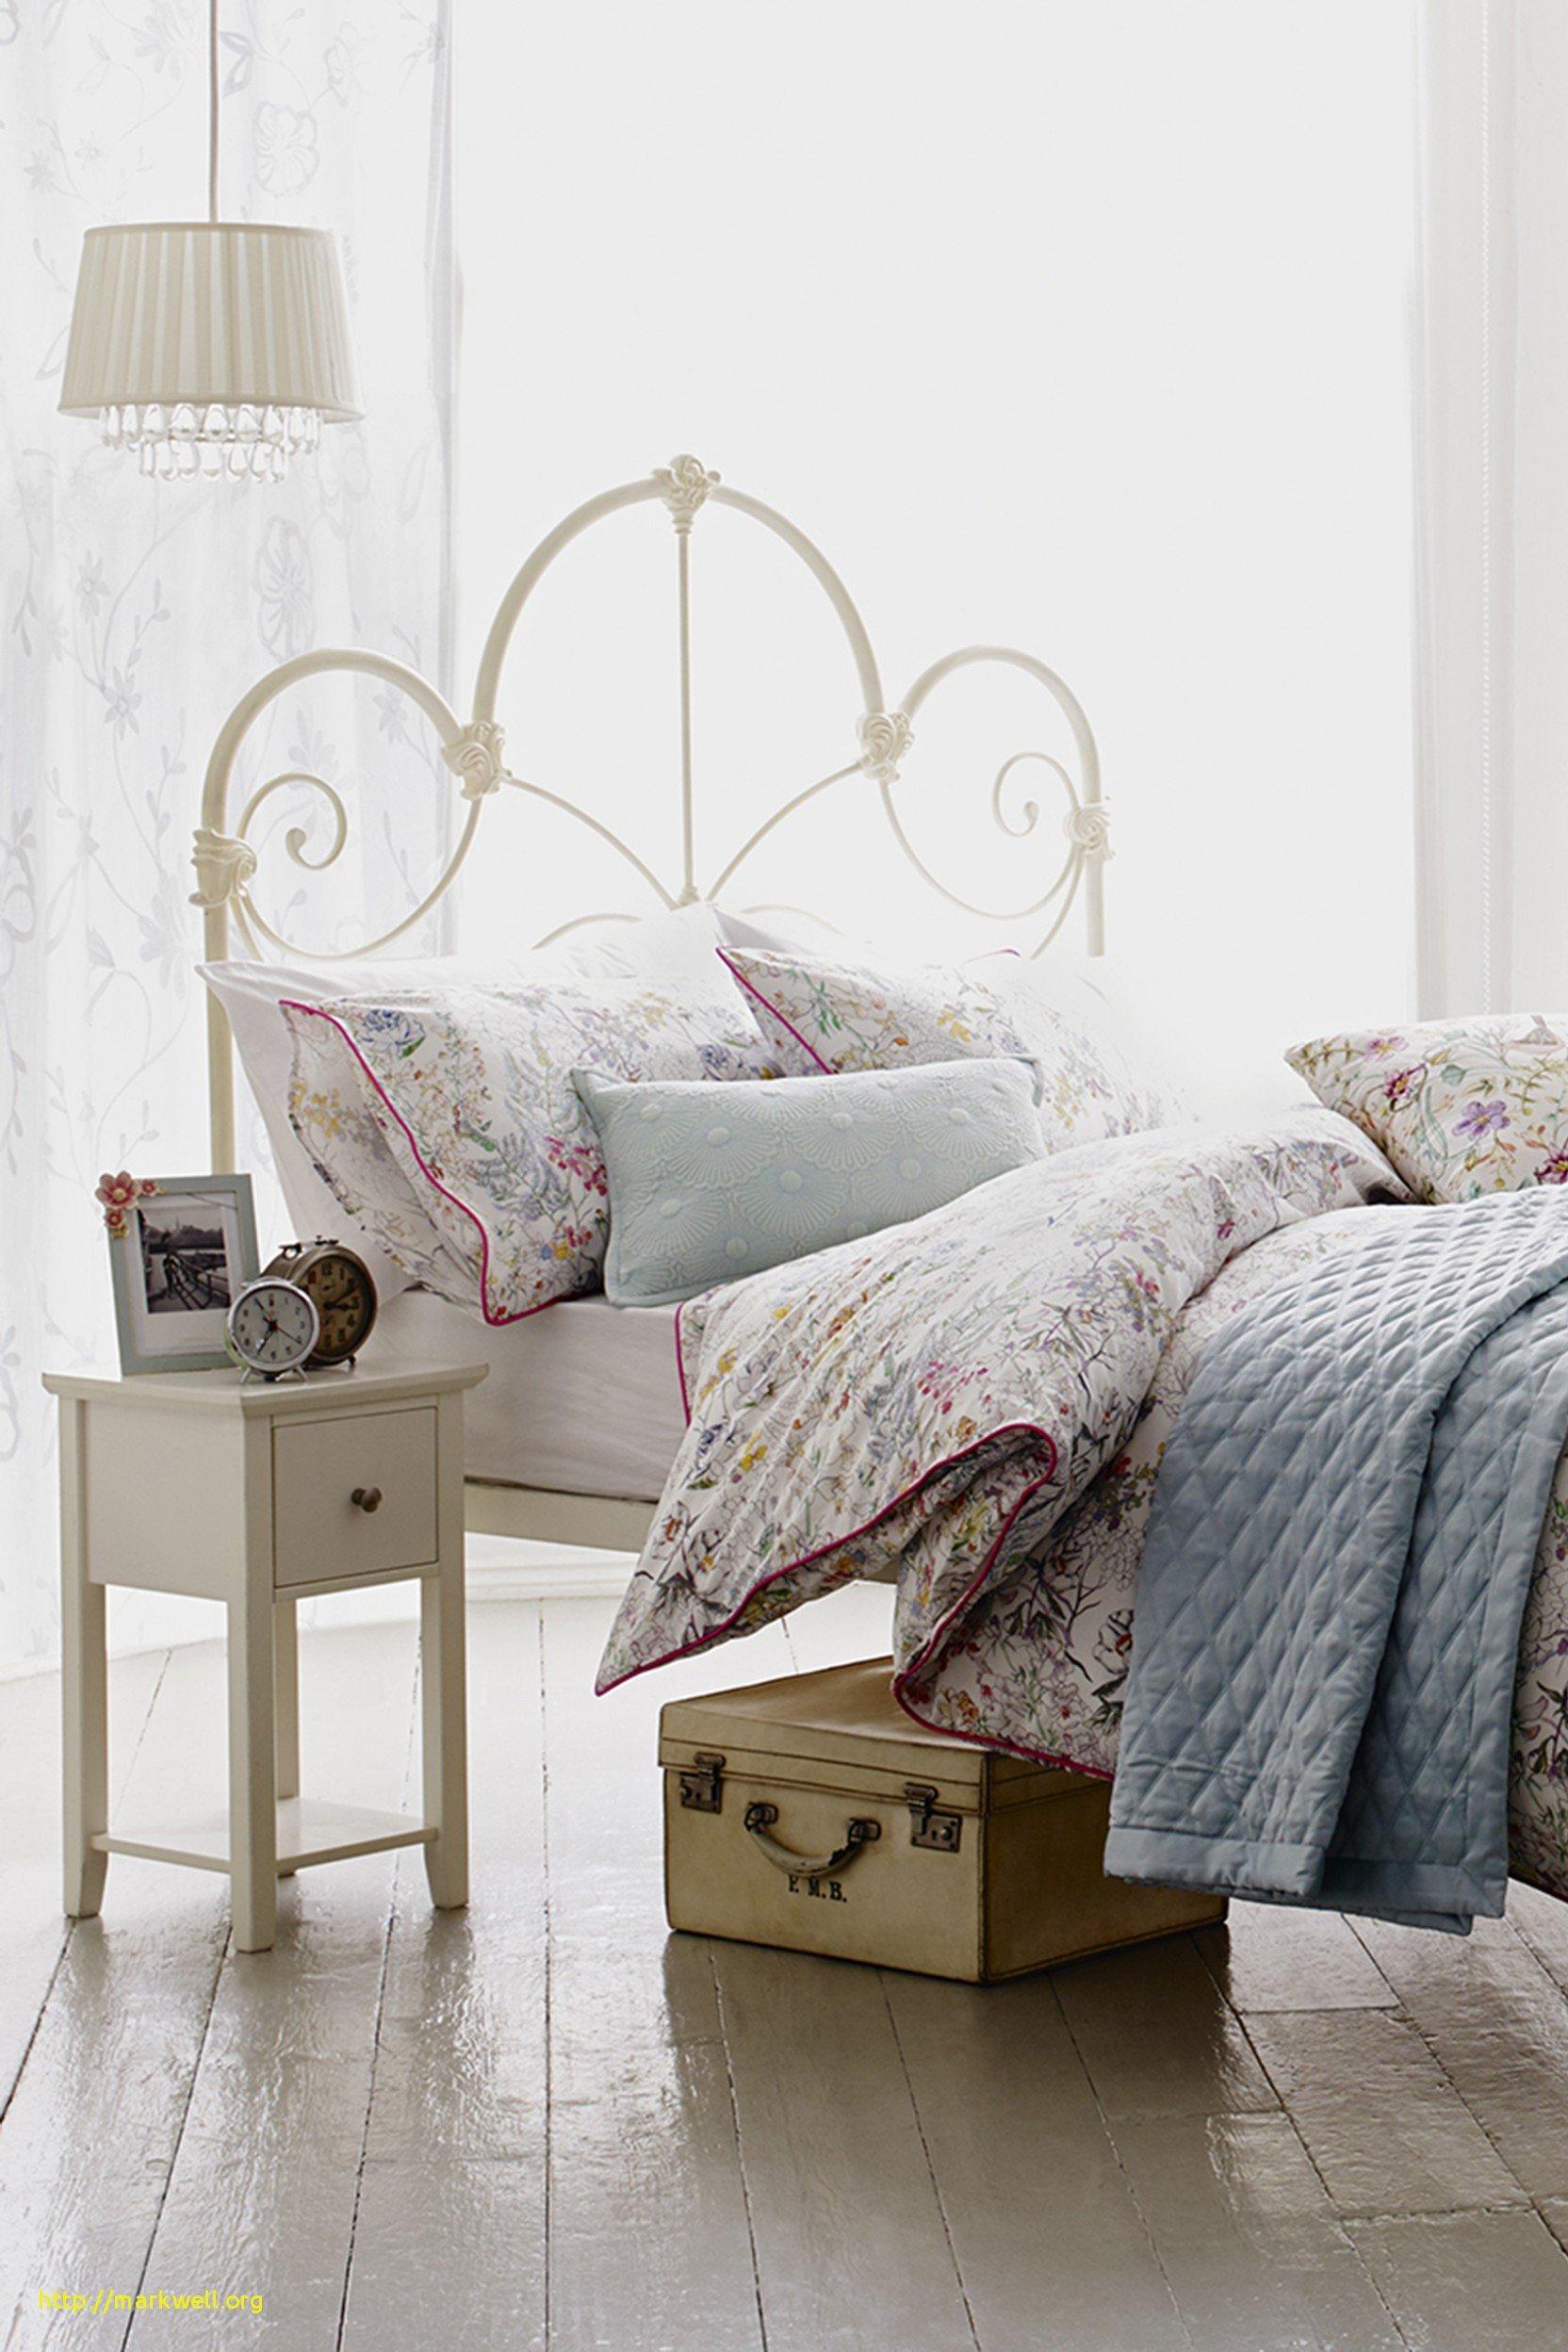 Indoor Hanging Chair for Bedroom Luxury Elegant Cheap Bedroom Chairs